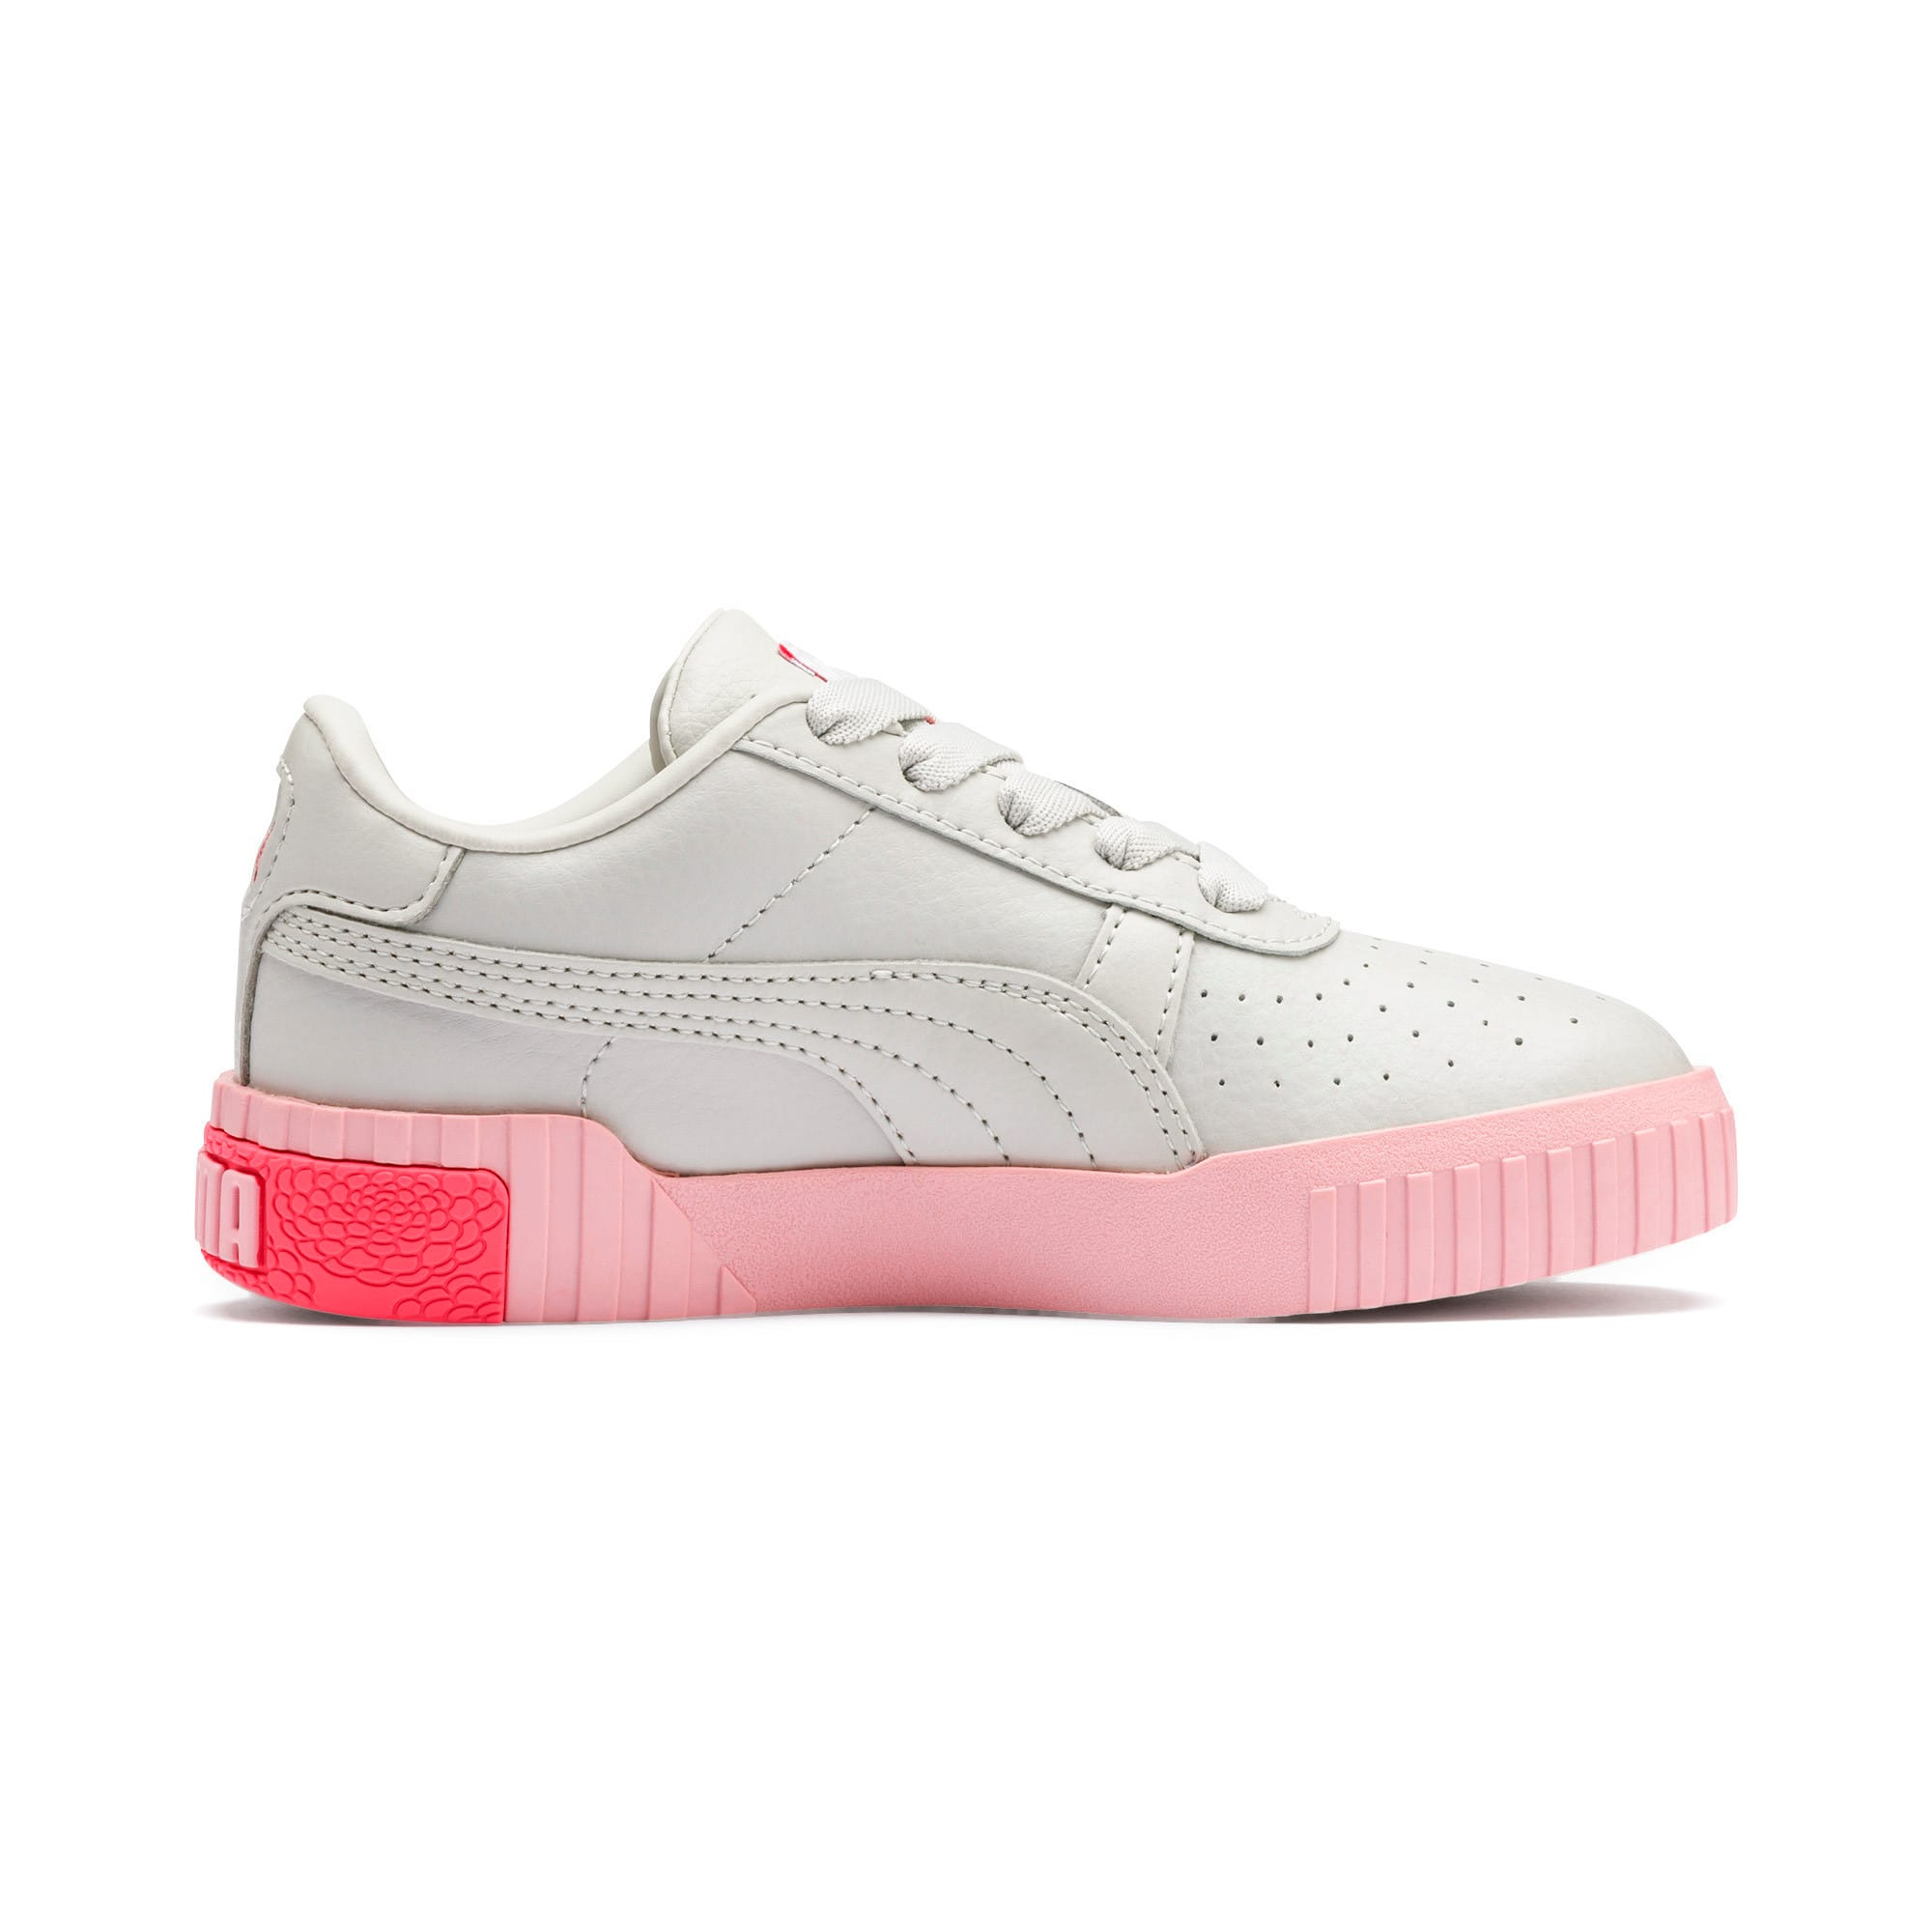 Thumbnail 5 of Cali Kids' Mädchen Sneaker, Gray Violet-Calypso Coral, medium